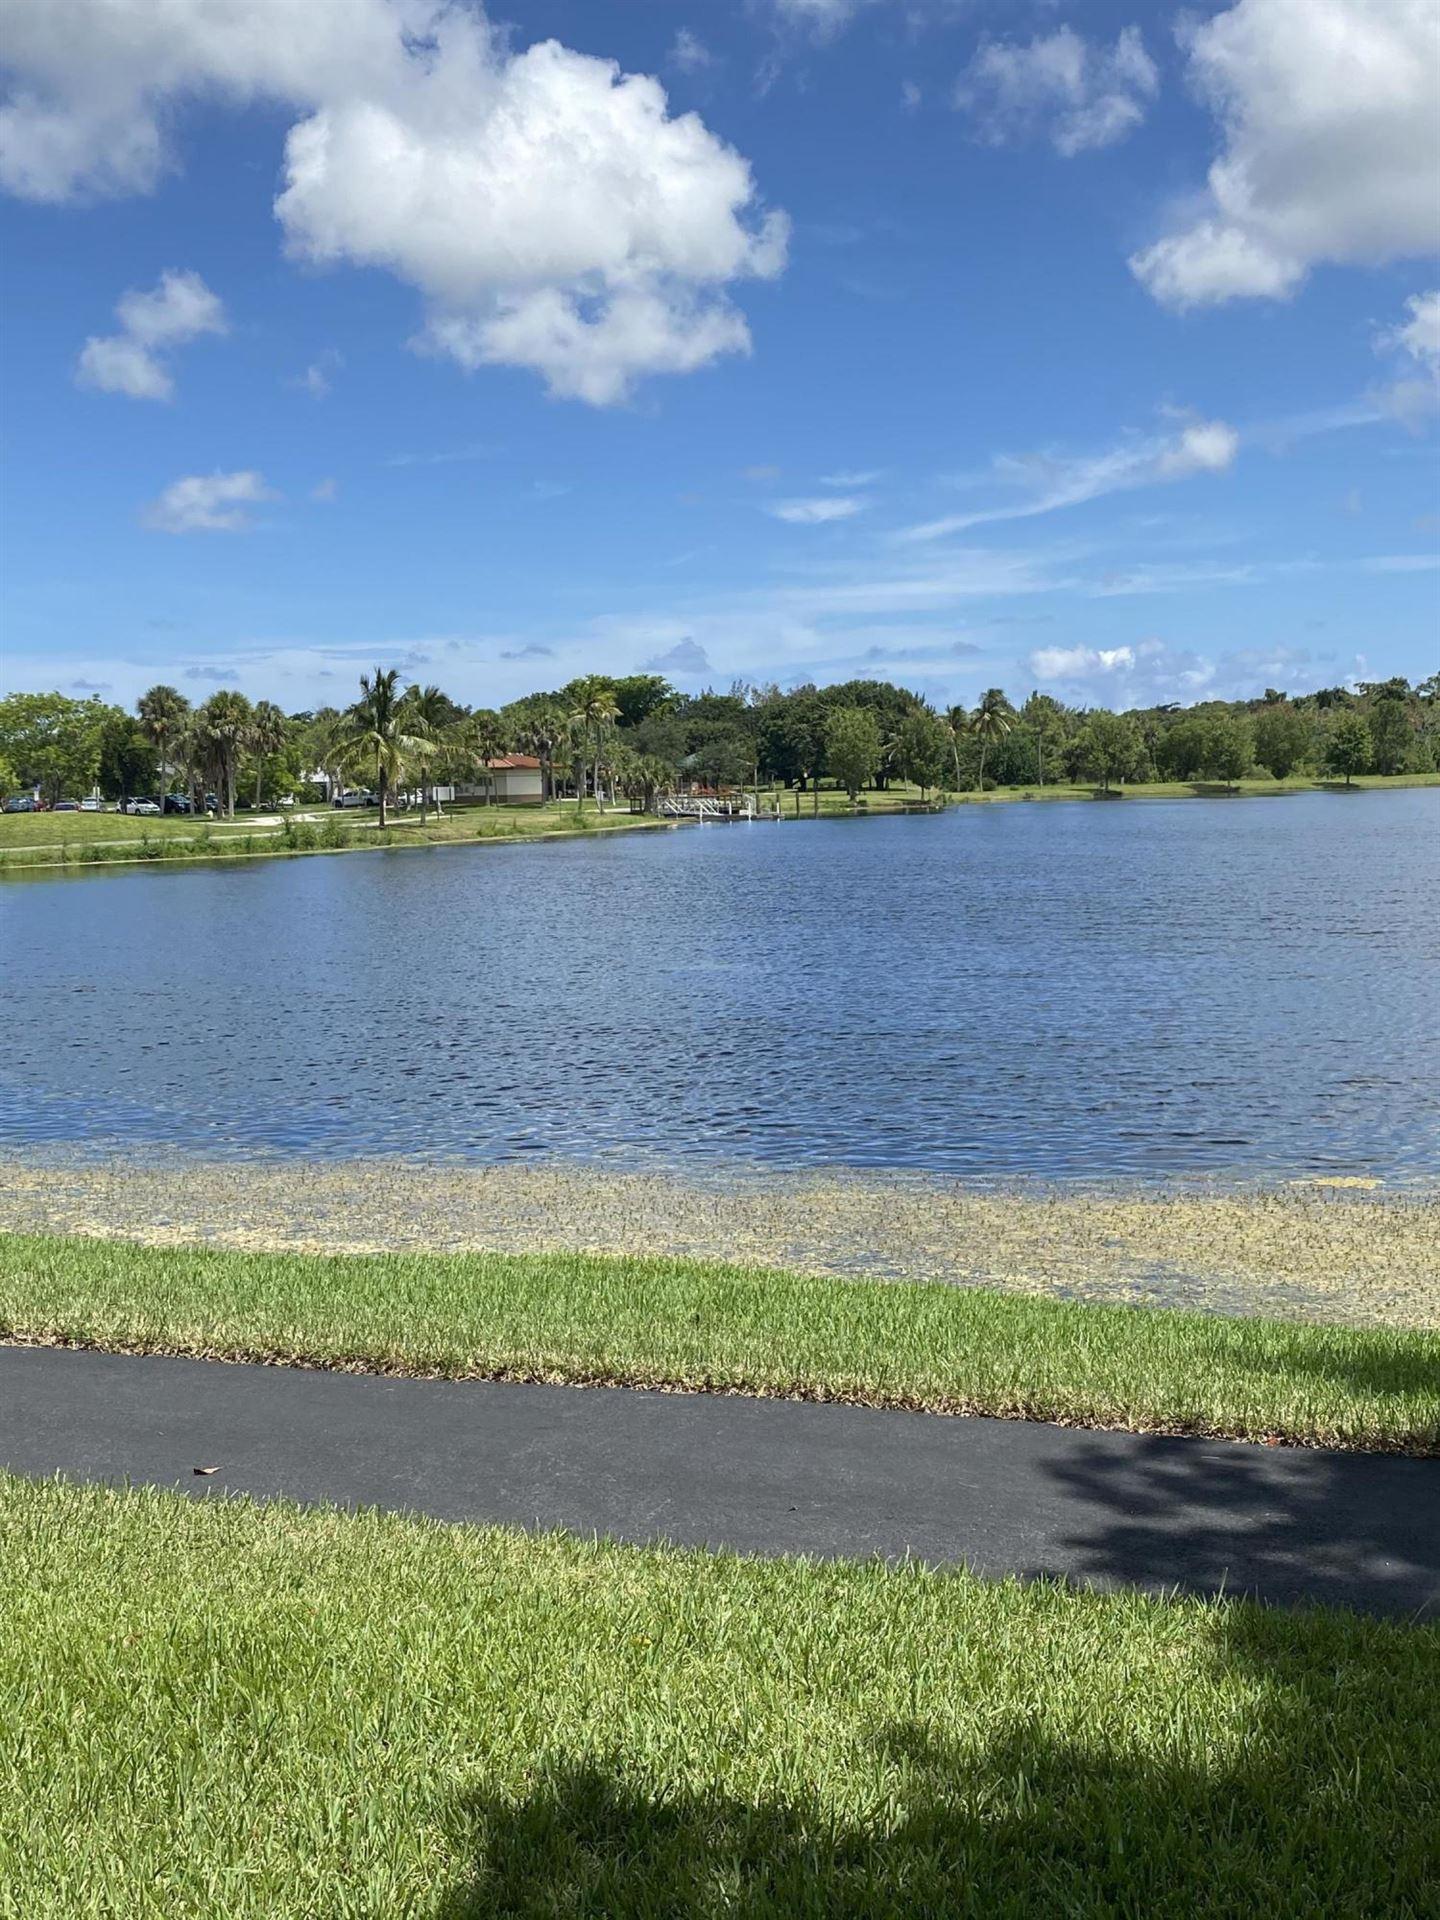 2842 S Carambola Circle S #19113, Coconut Creek, FL 33066 - #: RX-10645423